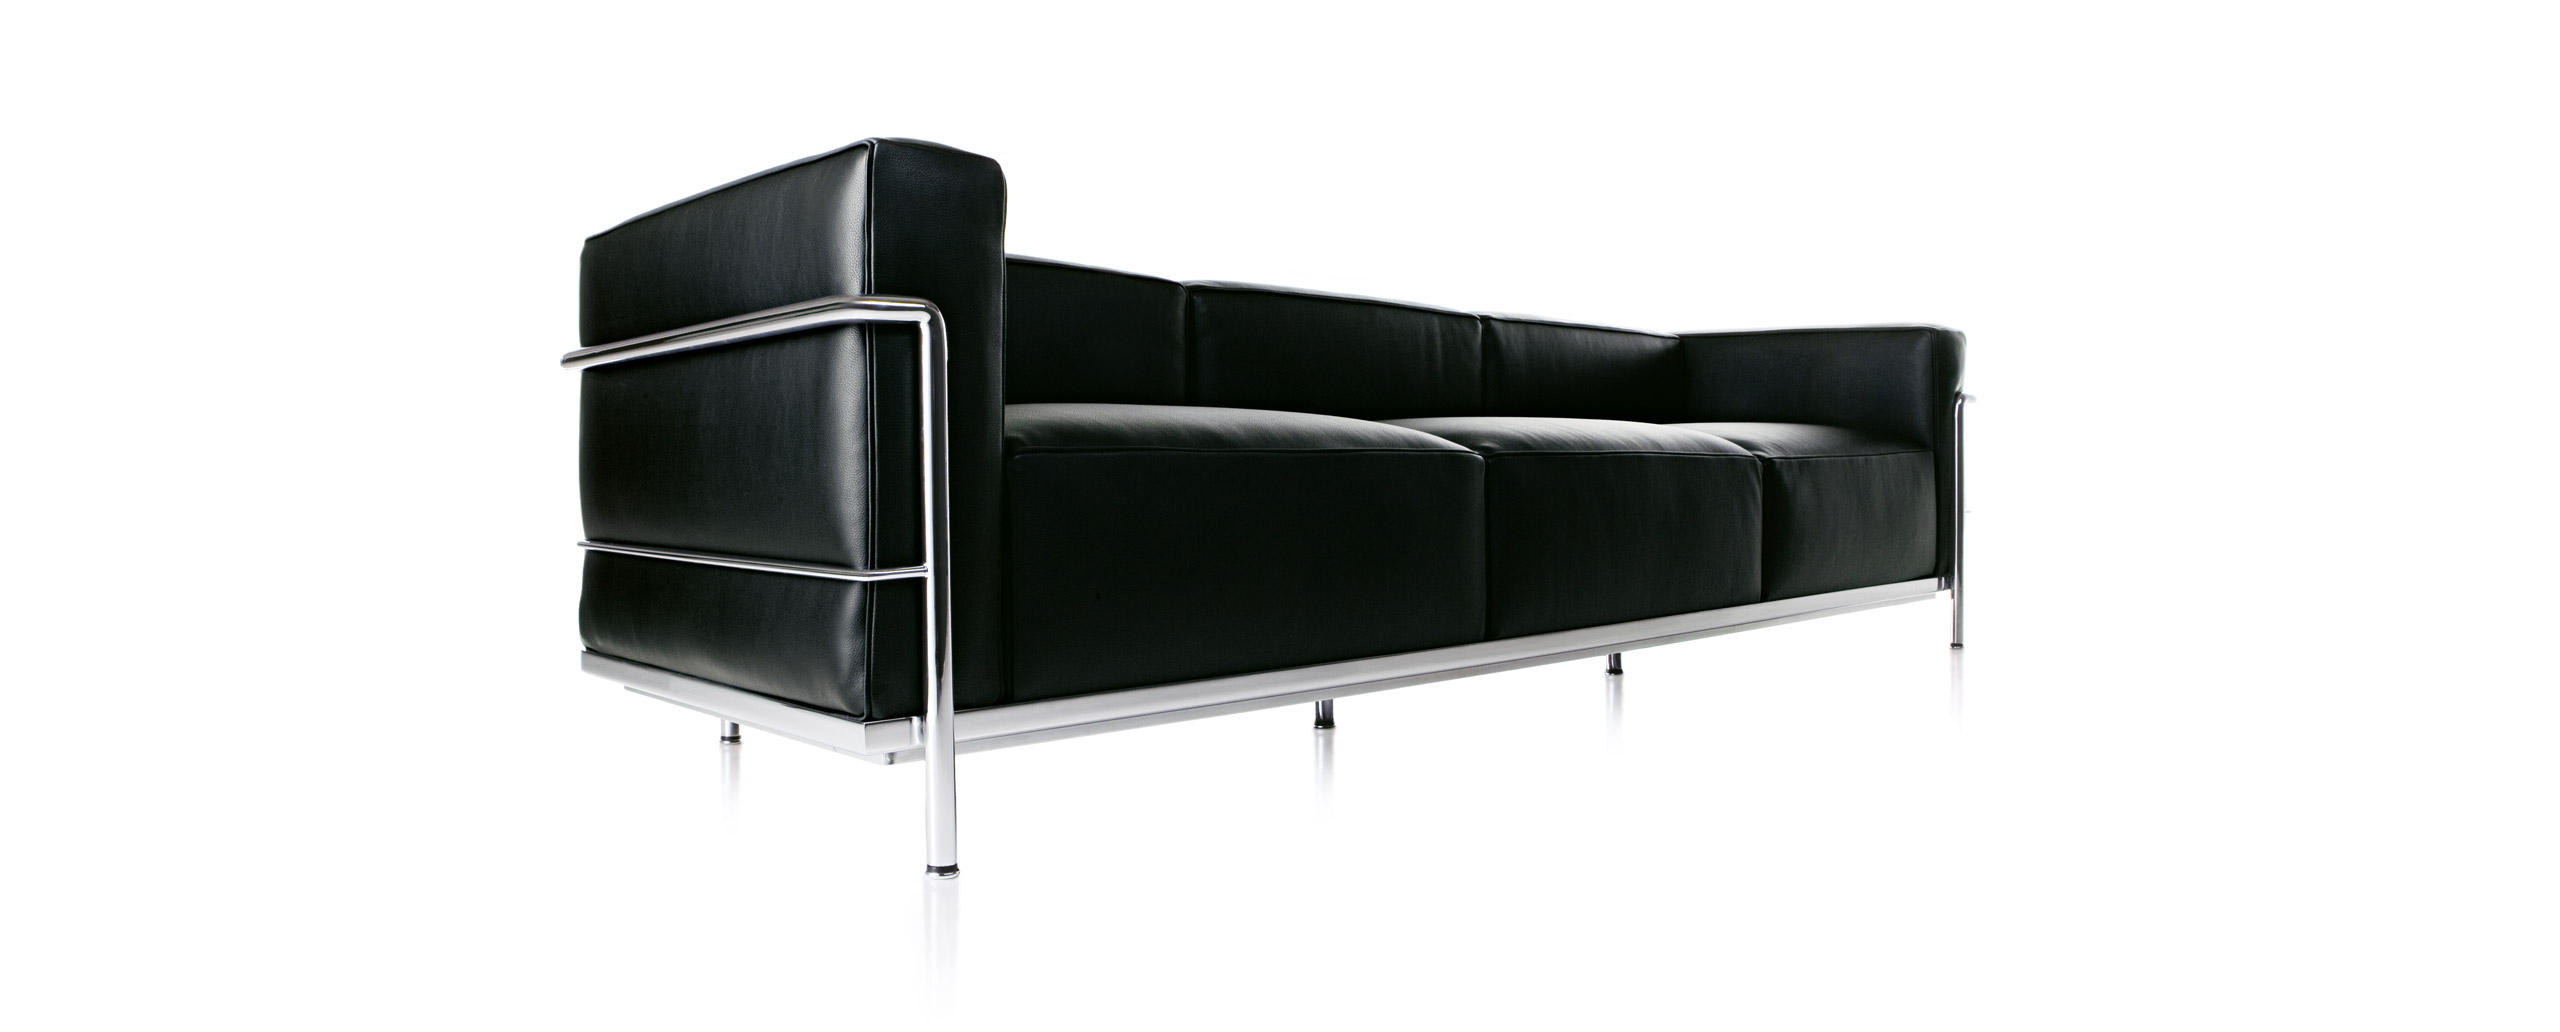 Awesome Cassina Le Corbusier Contemporary - Acomo.us - acomo.us